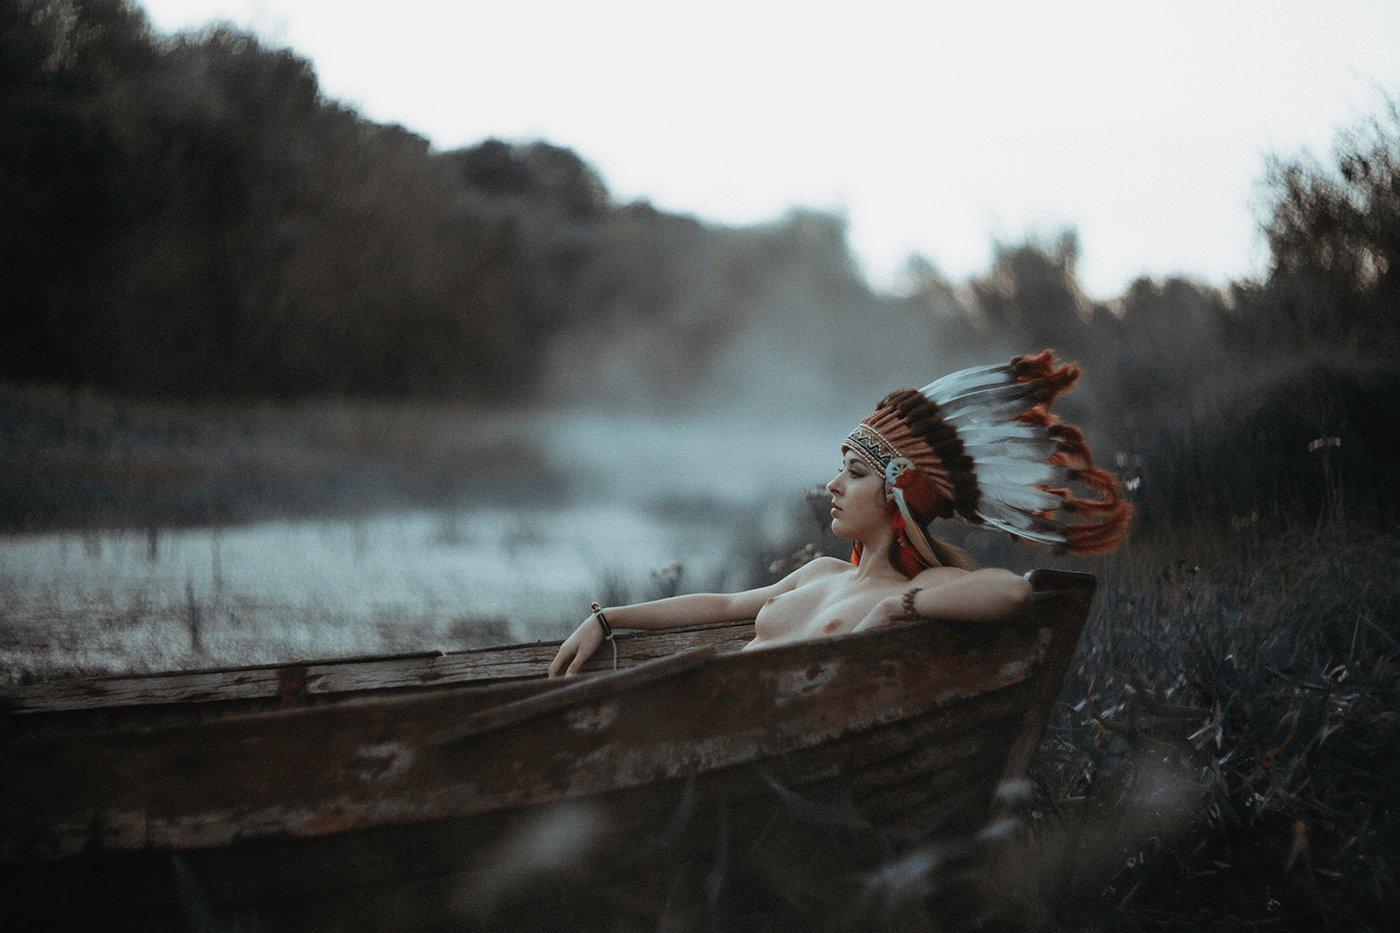 Girl, boat, canoe, Indian, hat, nude, Кузовков Александр